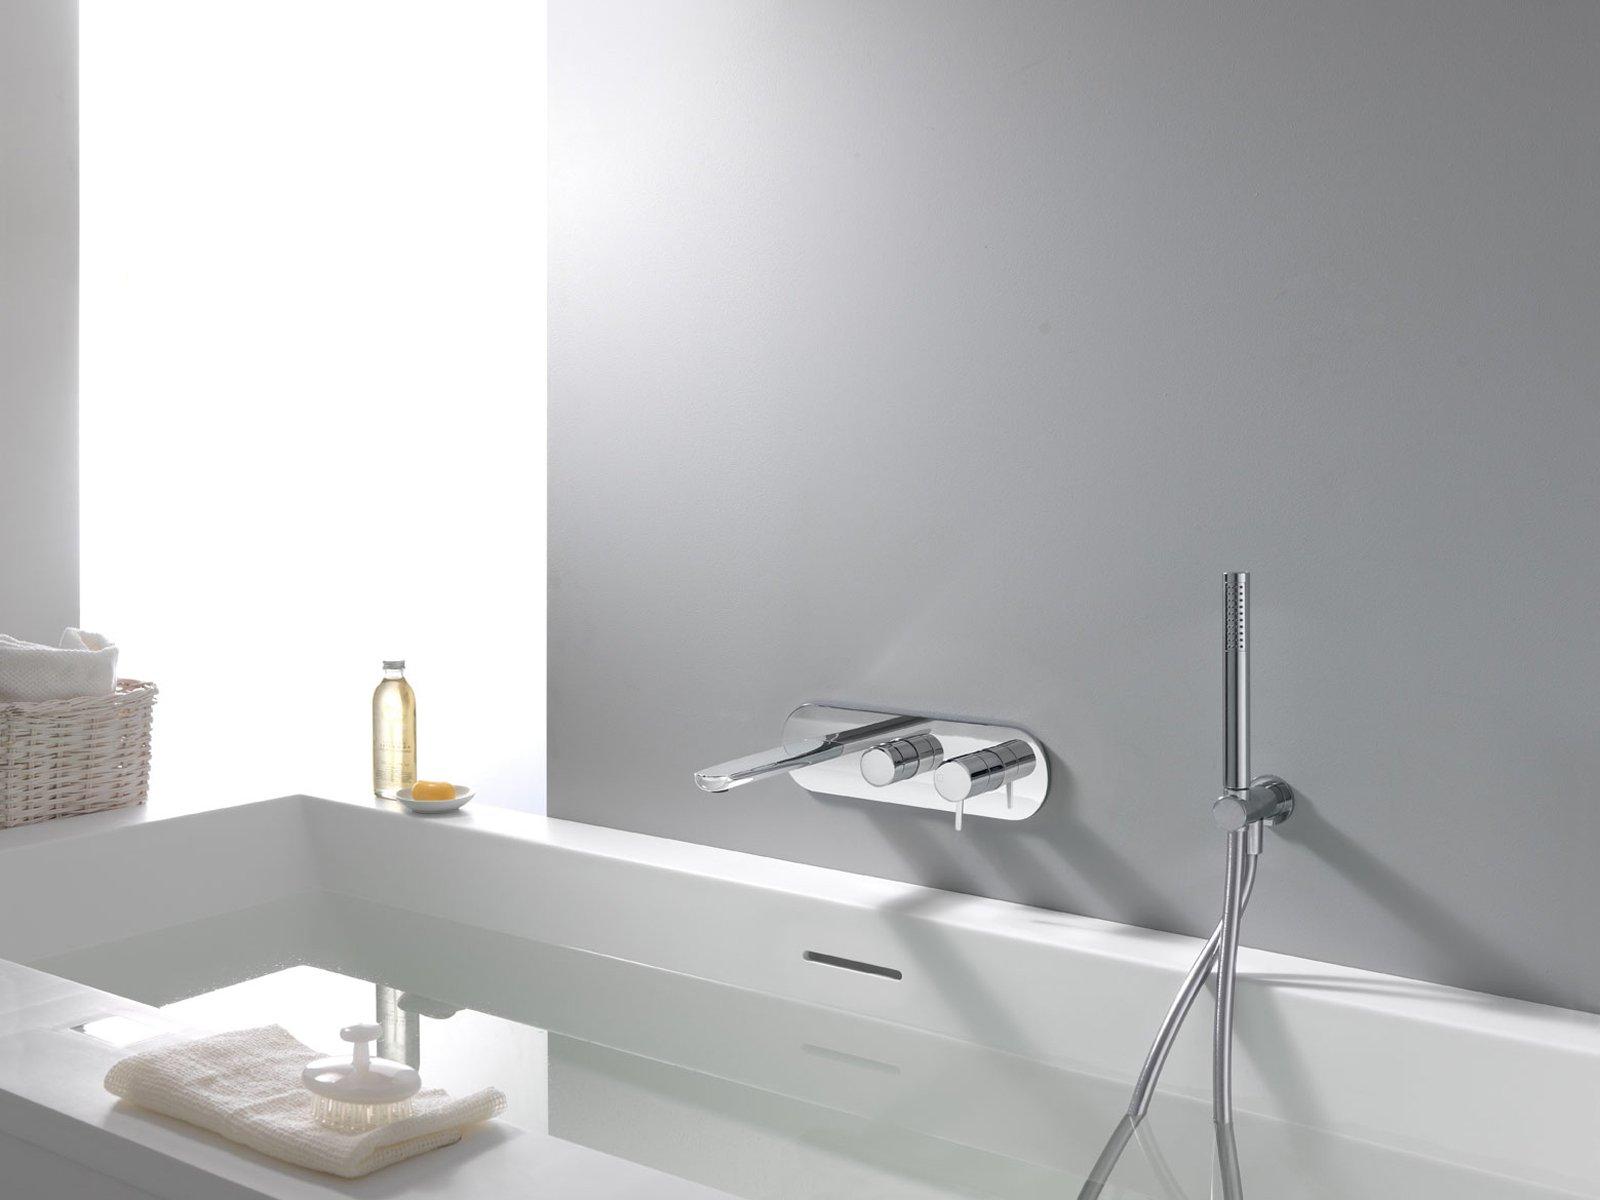 Rubinetteria per vasca - Cose di Casa